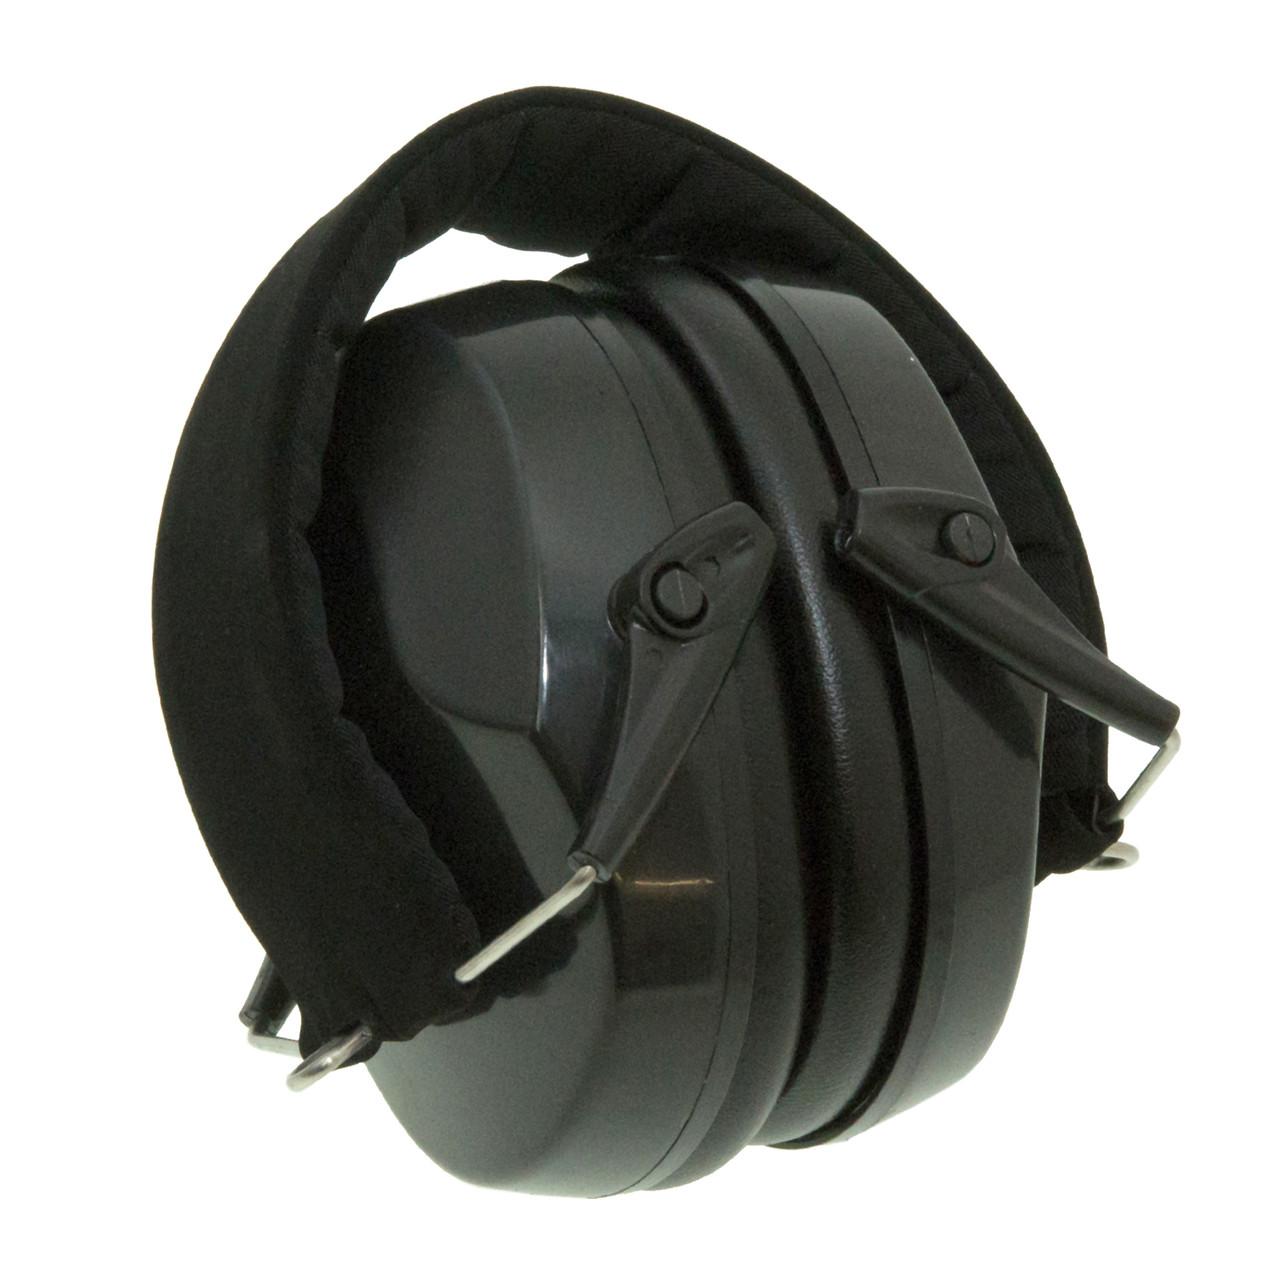 Навушники звукозахисні Max Fuchs Black 28703A